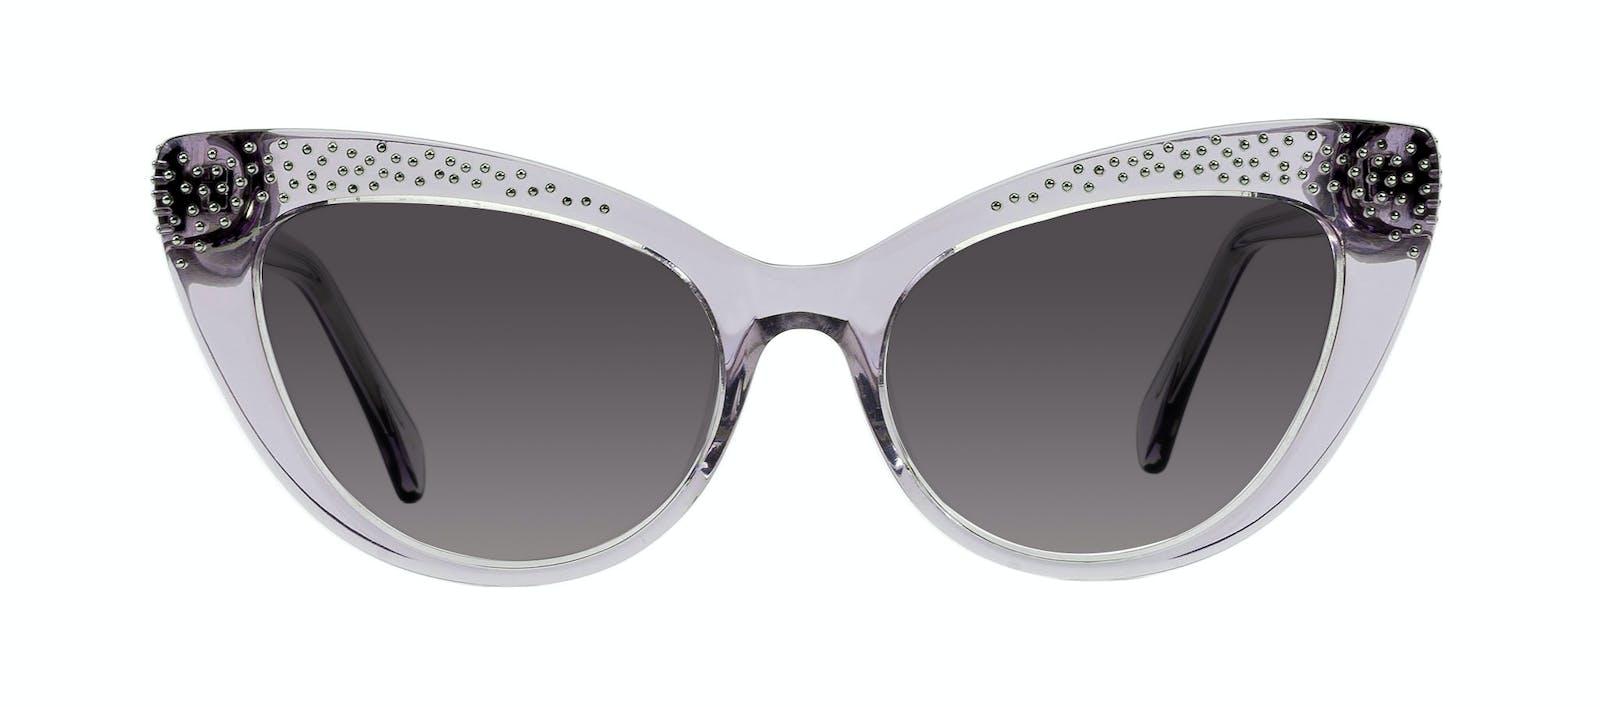 7cdcfa179dc Affordable Fashion Glasses Cat Eye Daring Cateye Sunglasses Women Keiko Moe  May Front